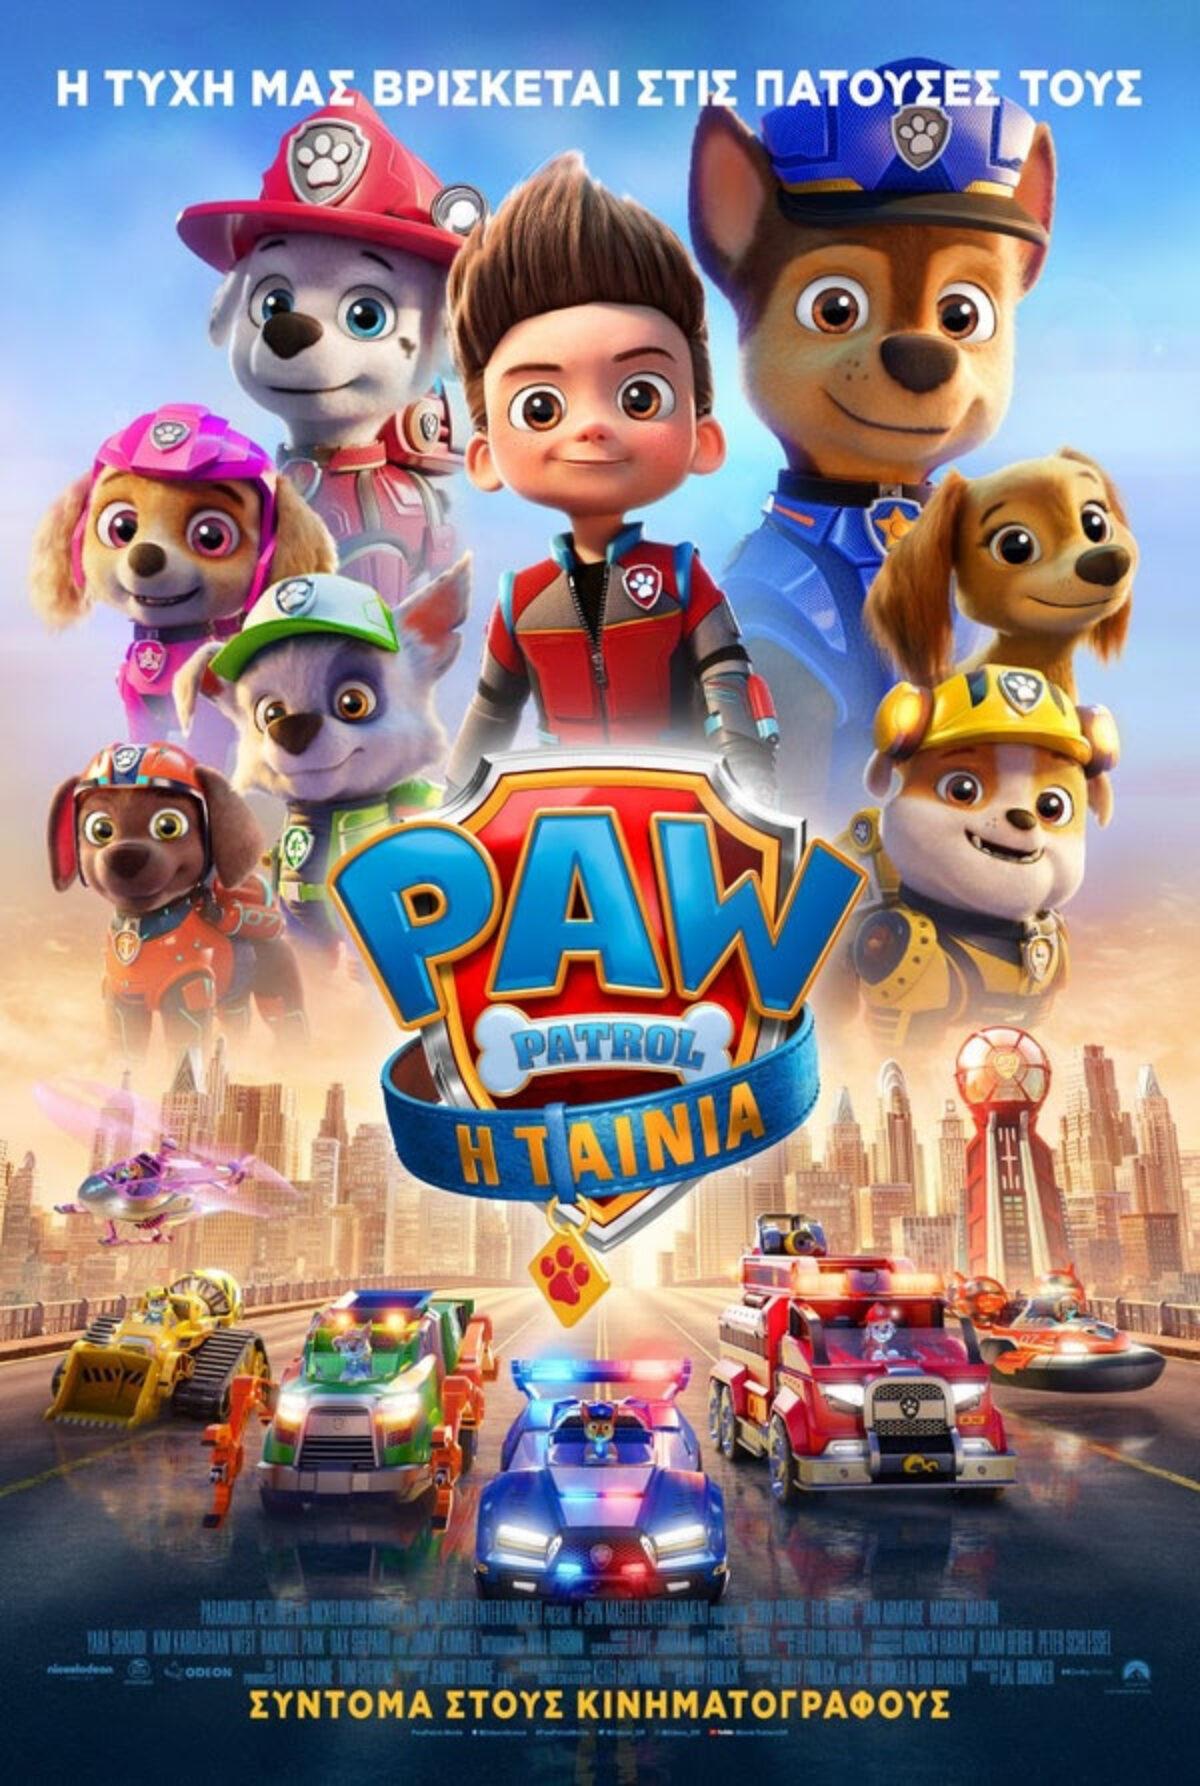 «Paw Patrol: Η Ταινία» (Paw Patrol: The Movie)   Τον Σεπτέμβριο στους Κινηματογράφους από την ODEON